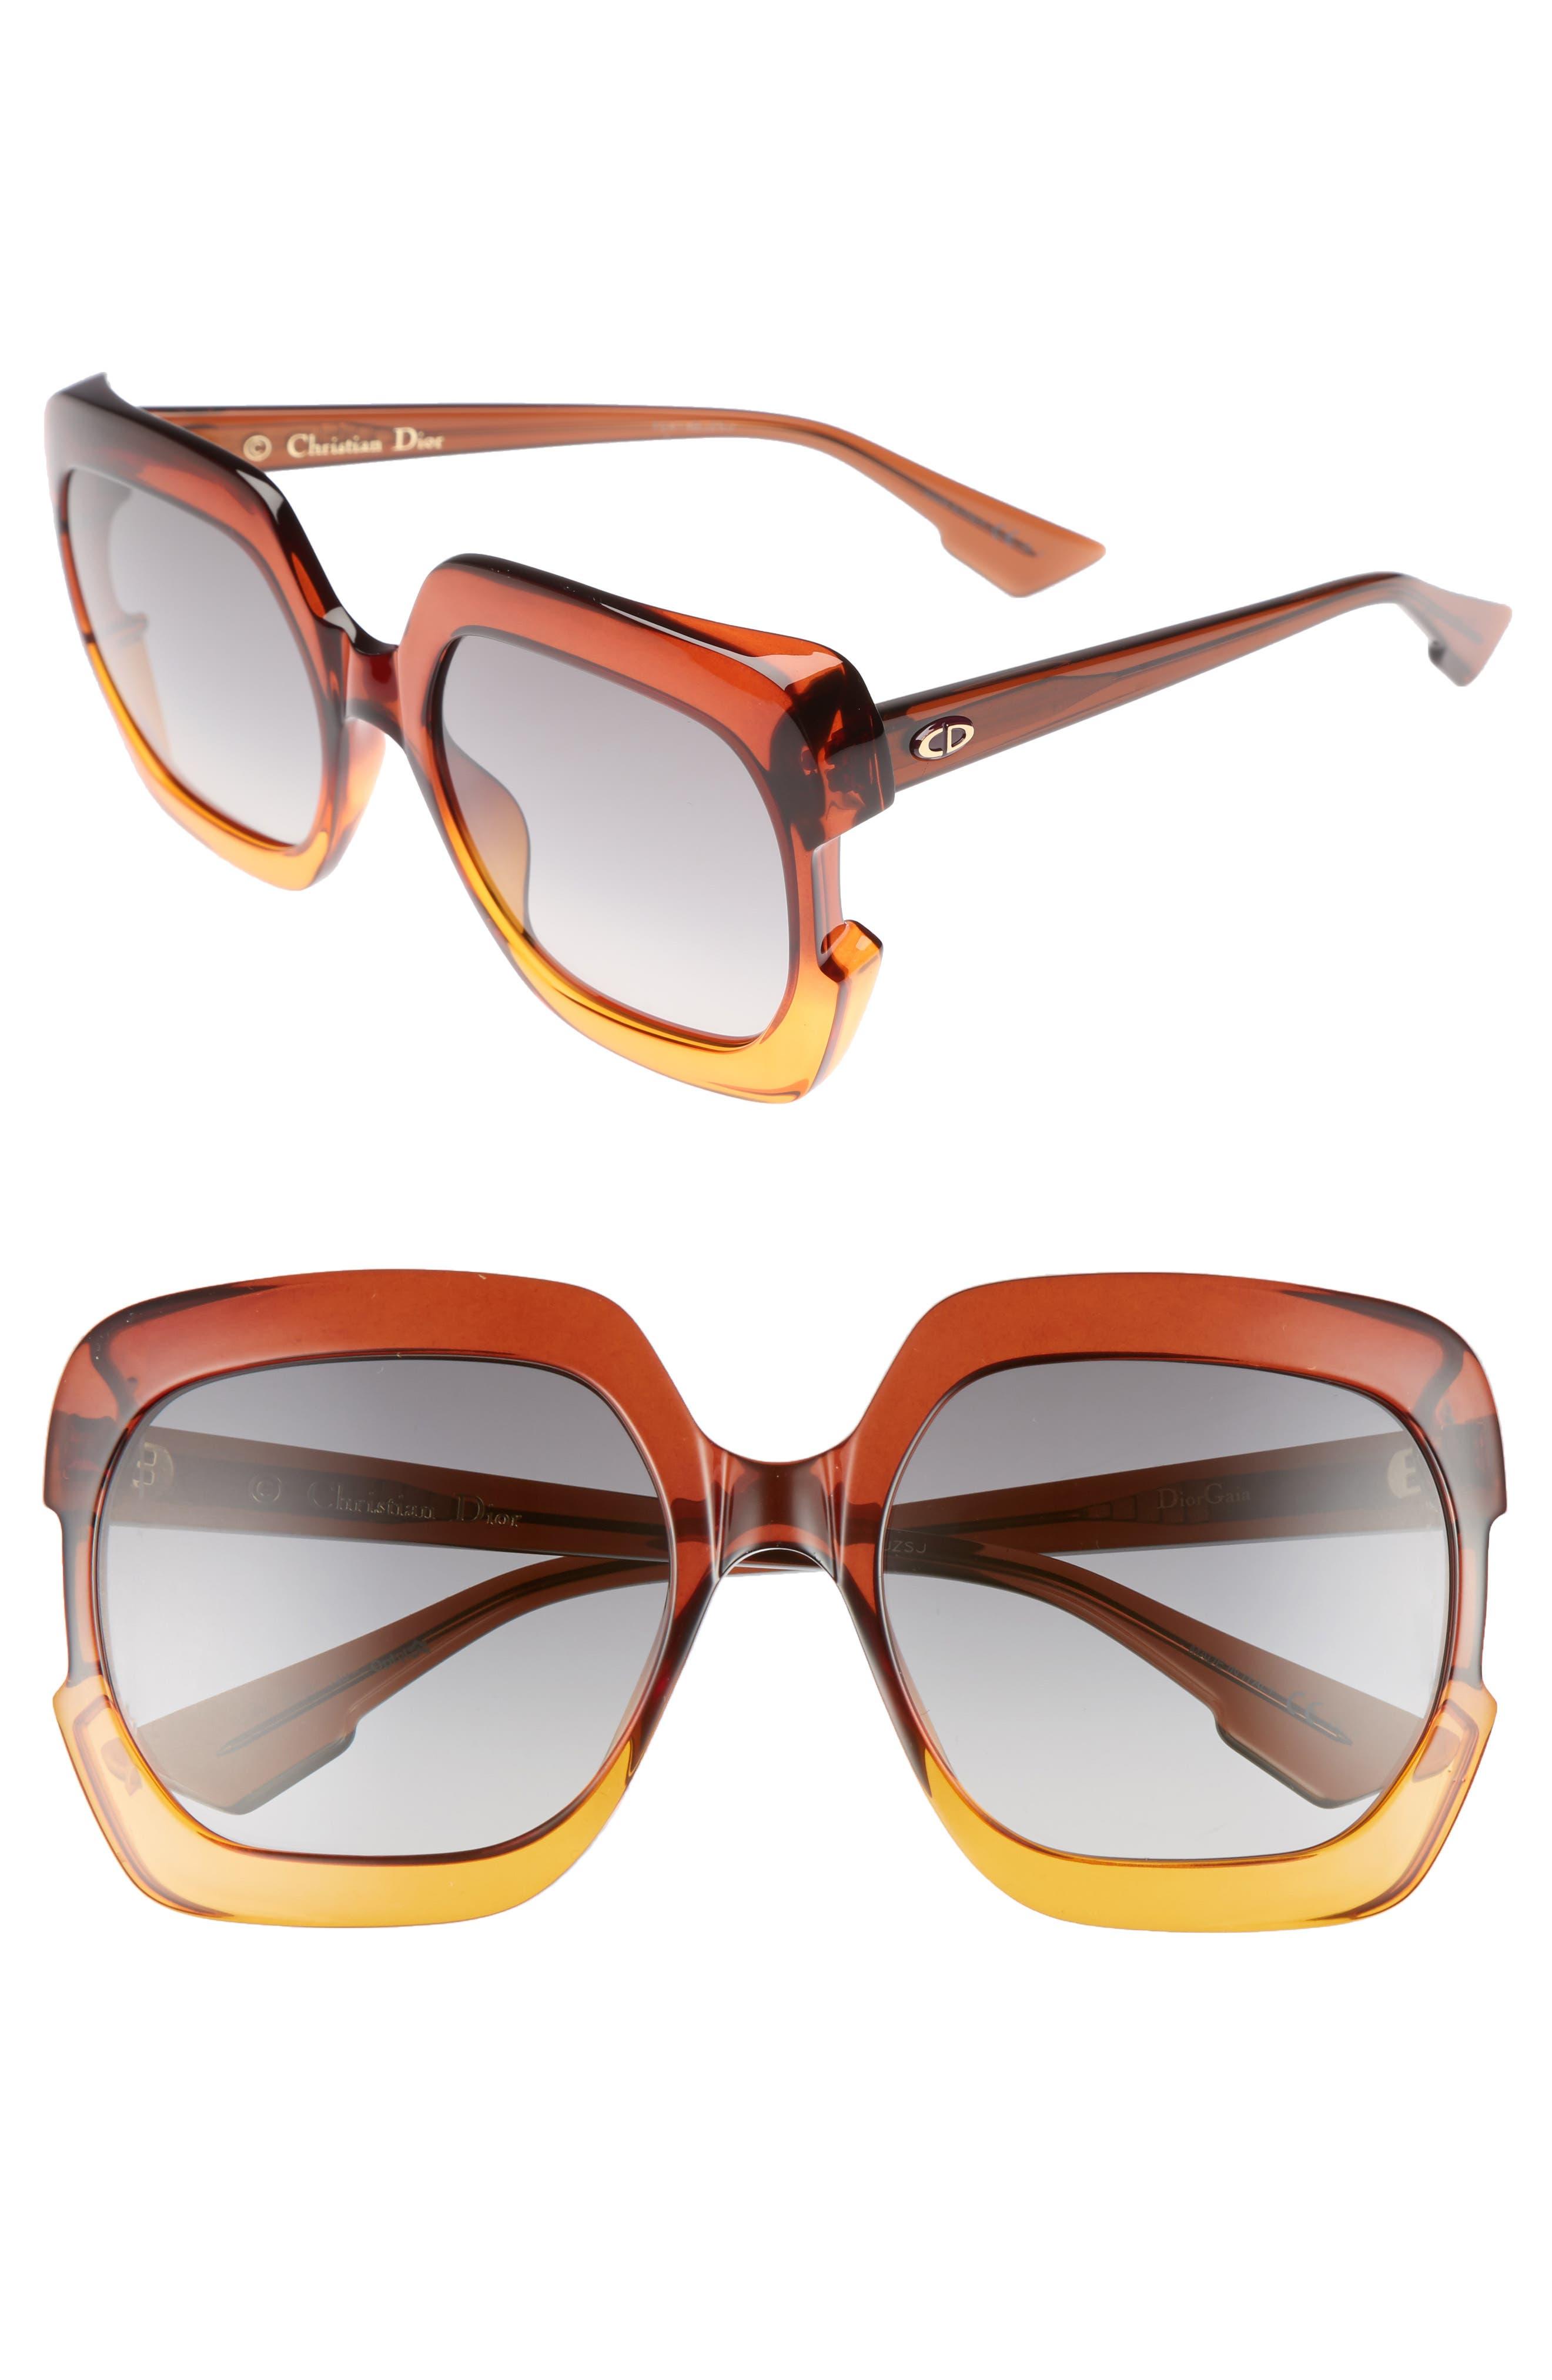 Main Image - Dior Gaia 58mm Square Sunglasses